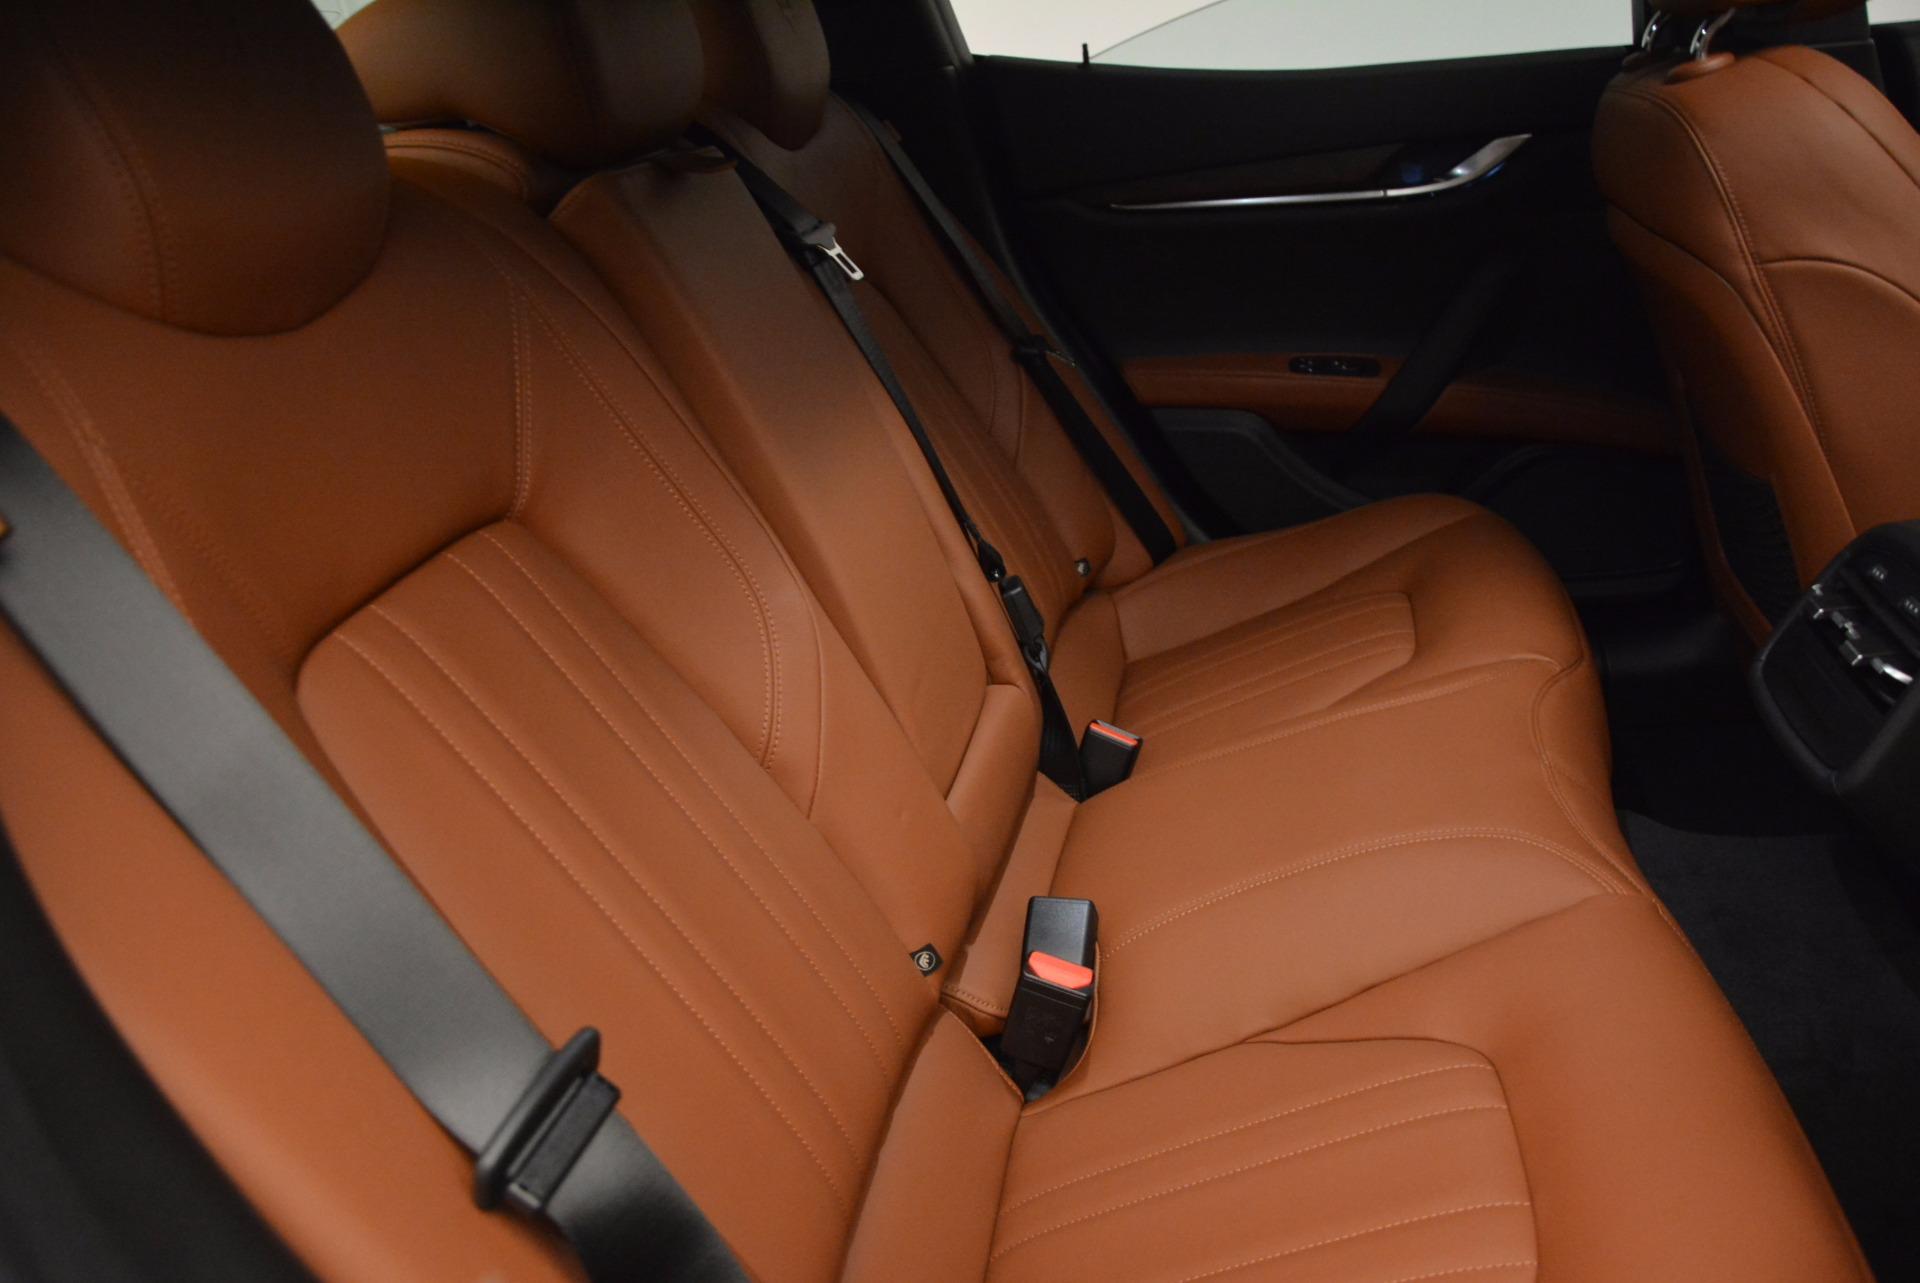 Used 2017 Maserati Ghibli S Q4 Ex-Loaner For Sale In Greenwich, CT 1165_p19